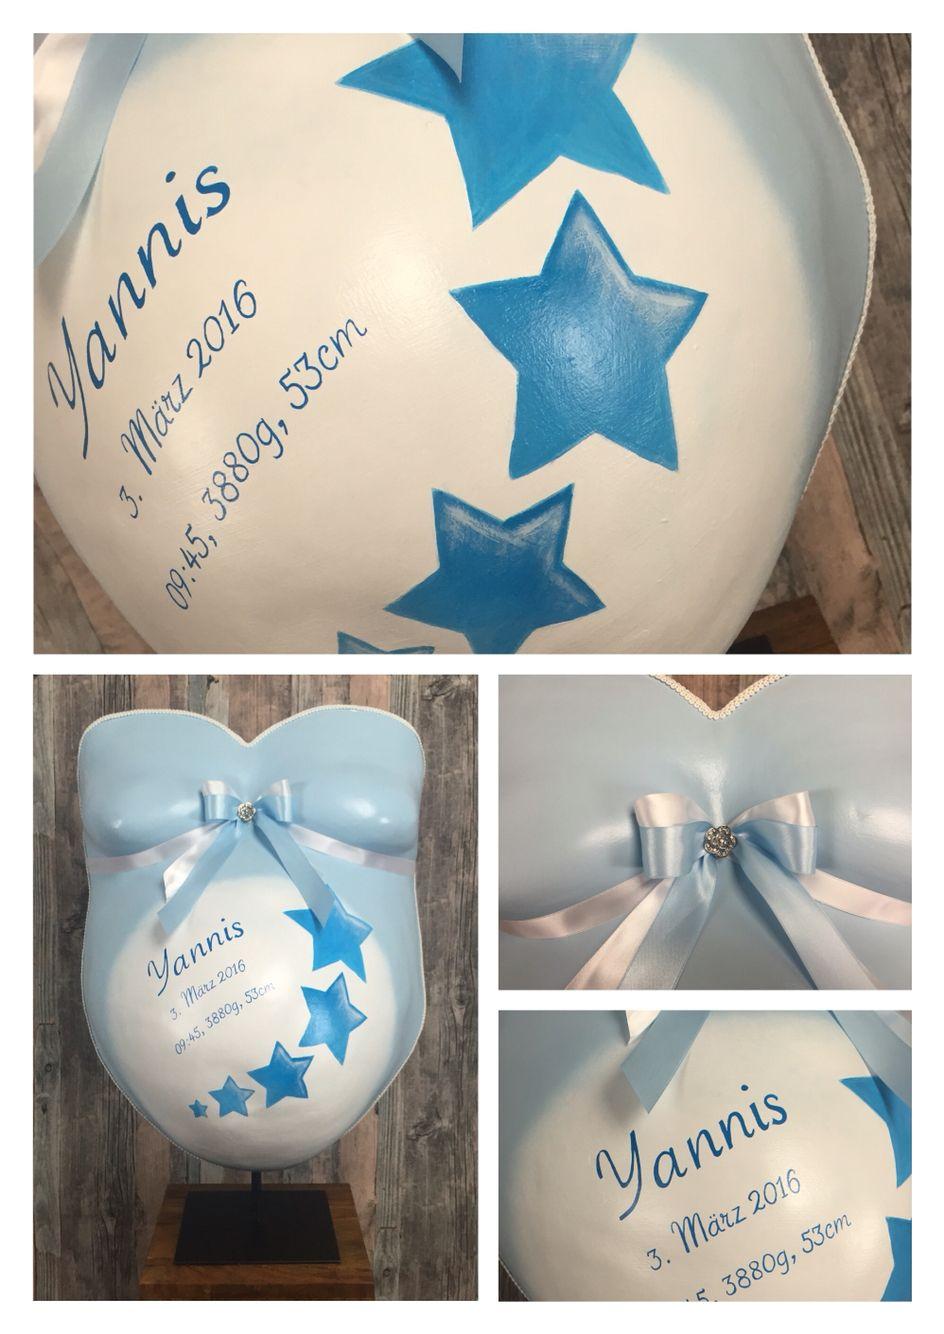 Blue Star, Belly cast, designed by Bea's  www.babybauch-abdruck.ch